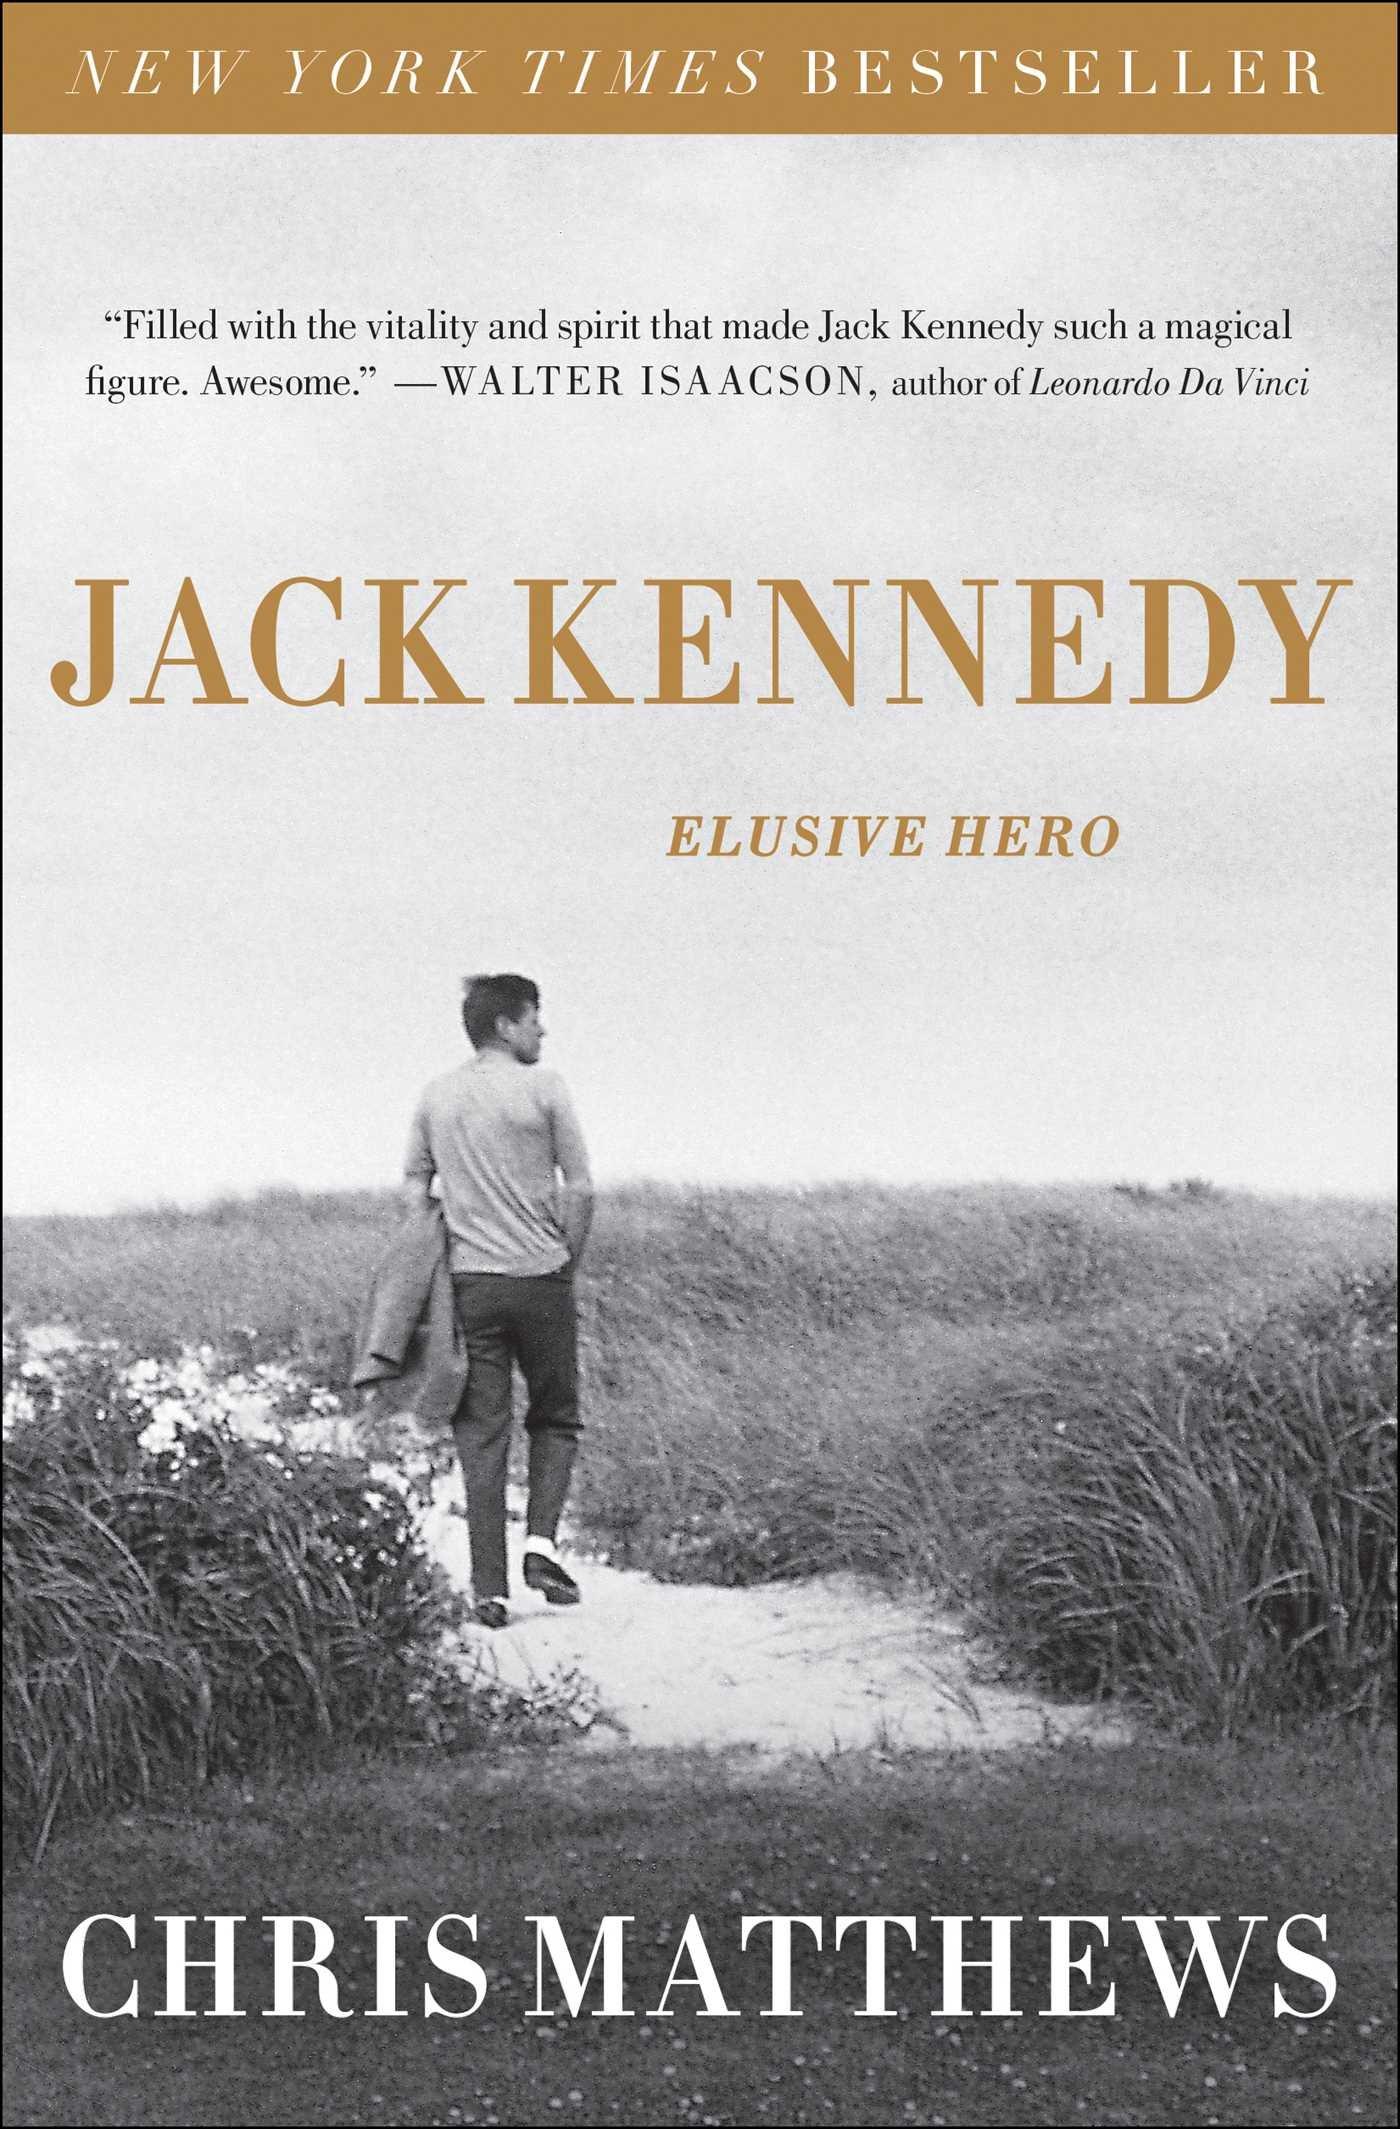 JACK KENNEDY: Elusive Hero ebook